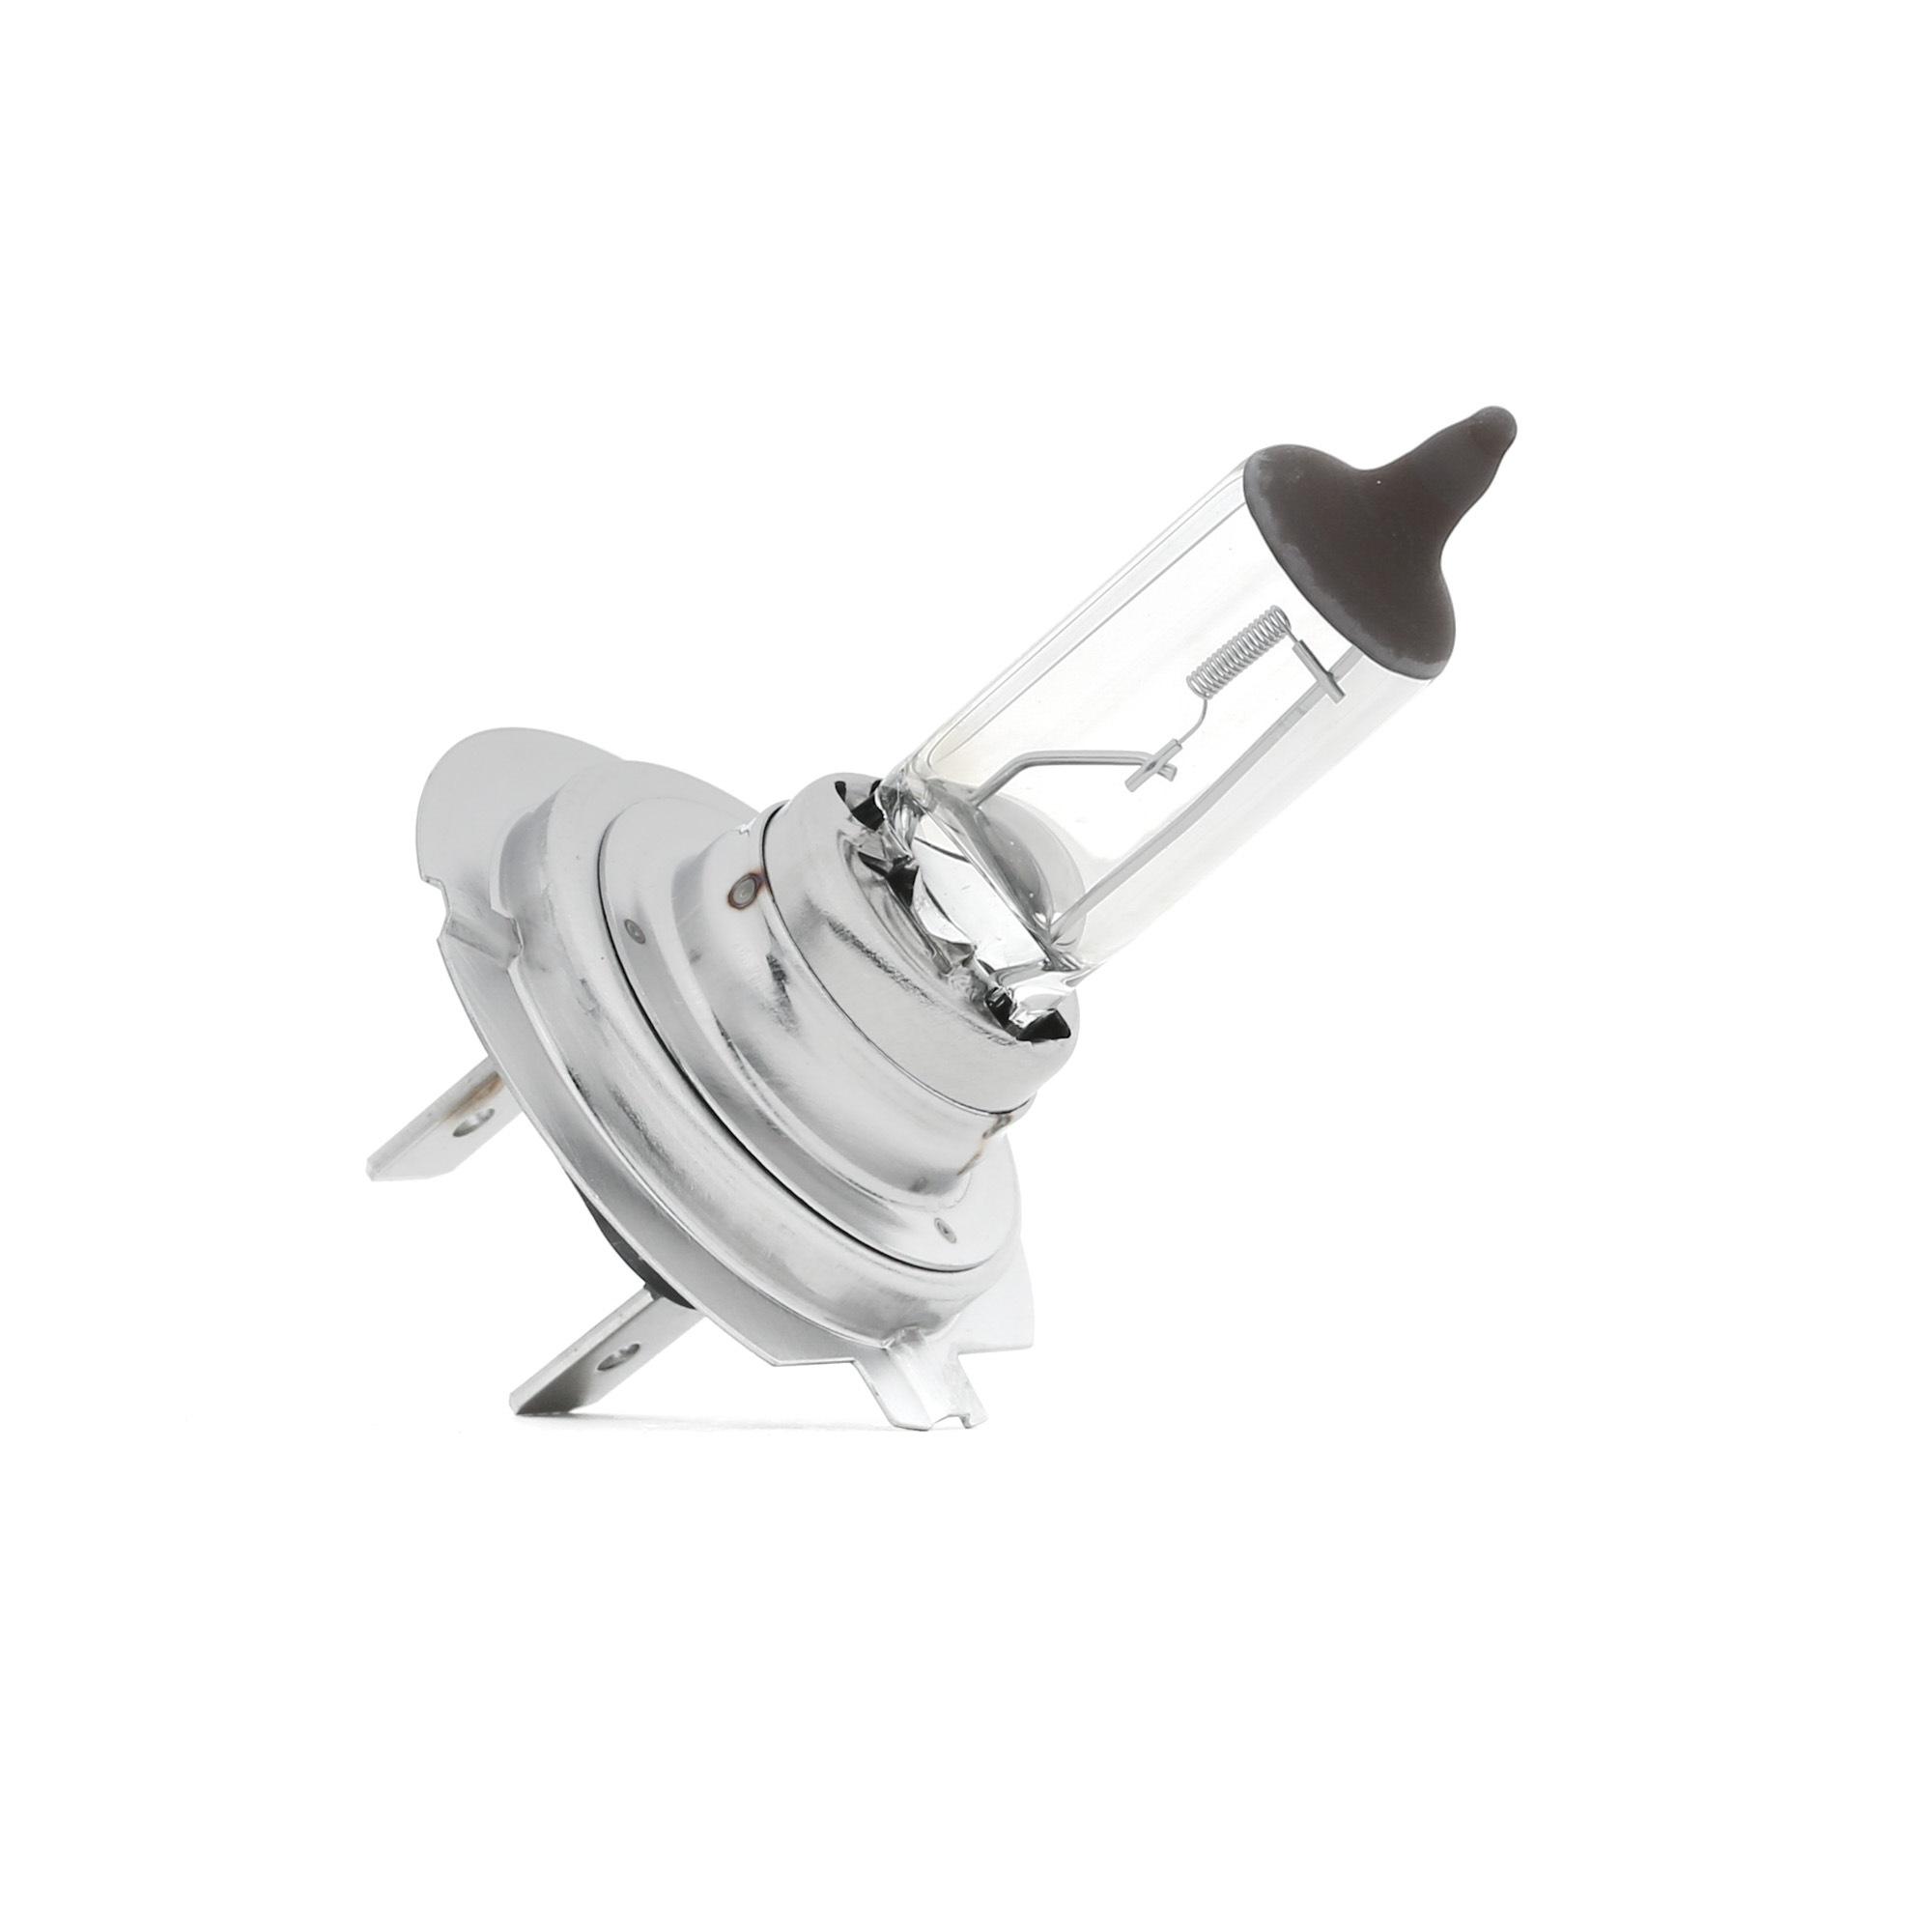 Spotlight bulb 48358 NARVA — only new parts